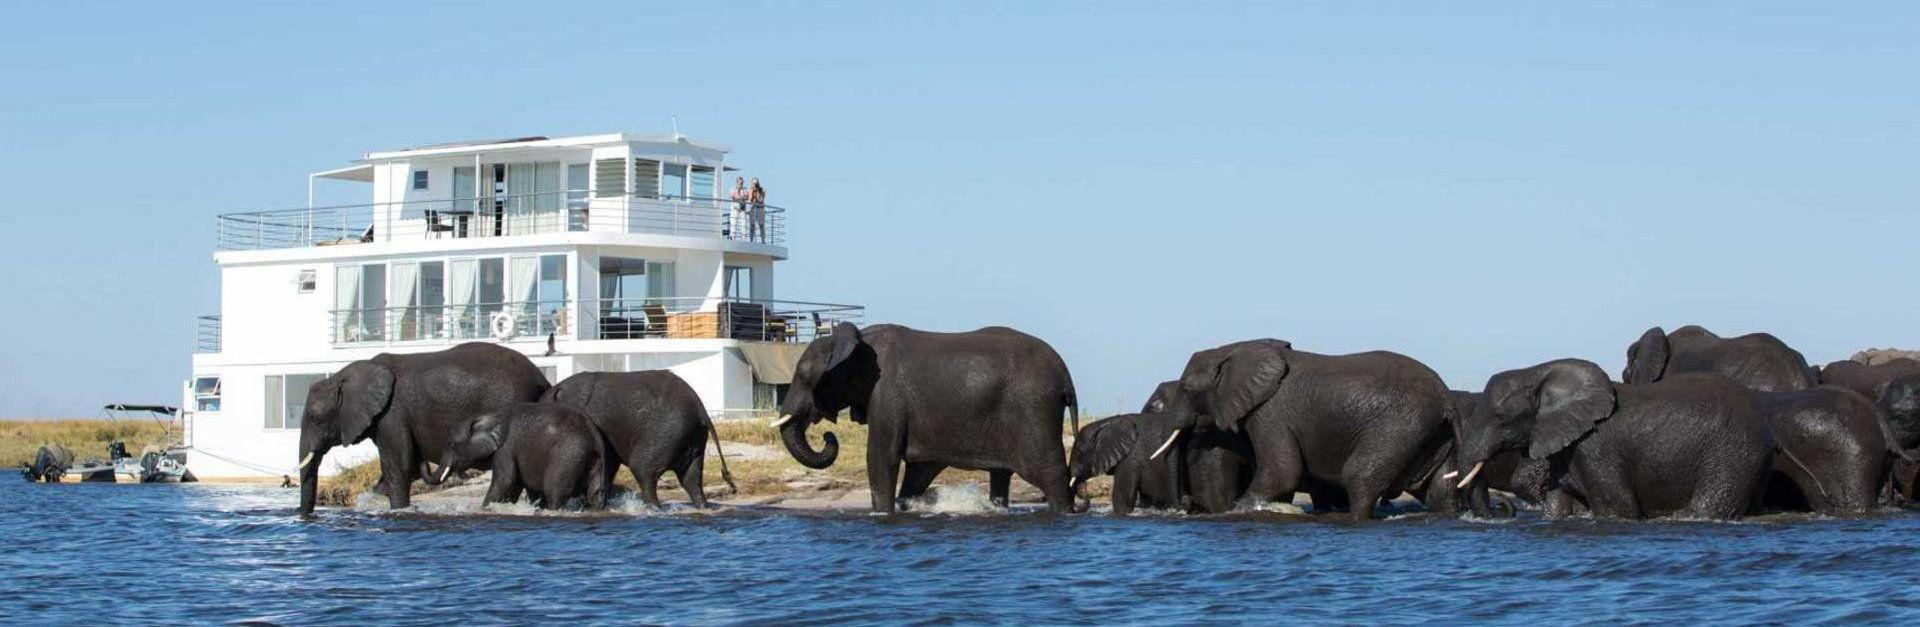 Tailormade Safaris Chobe River Houseboats